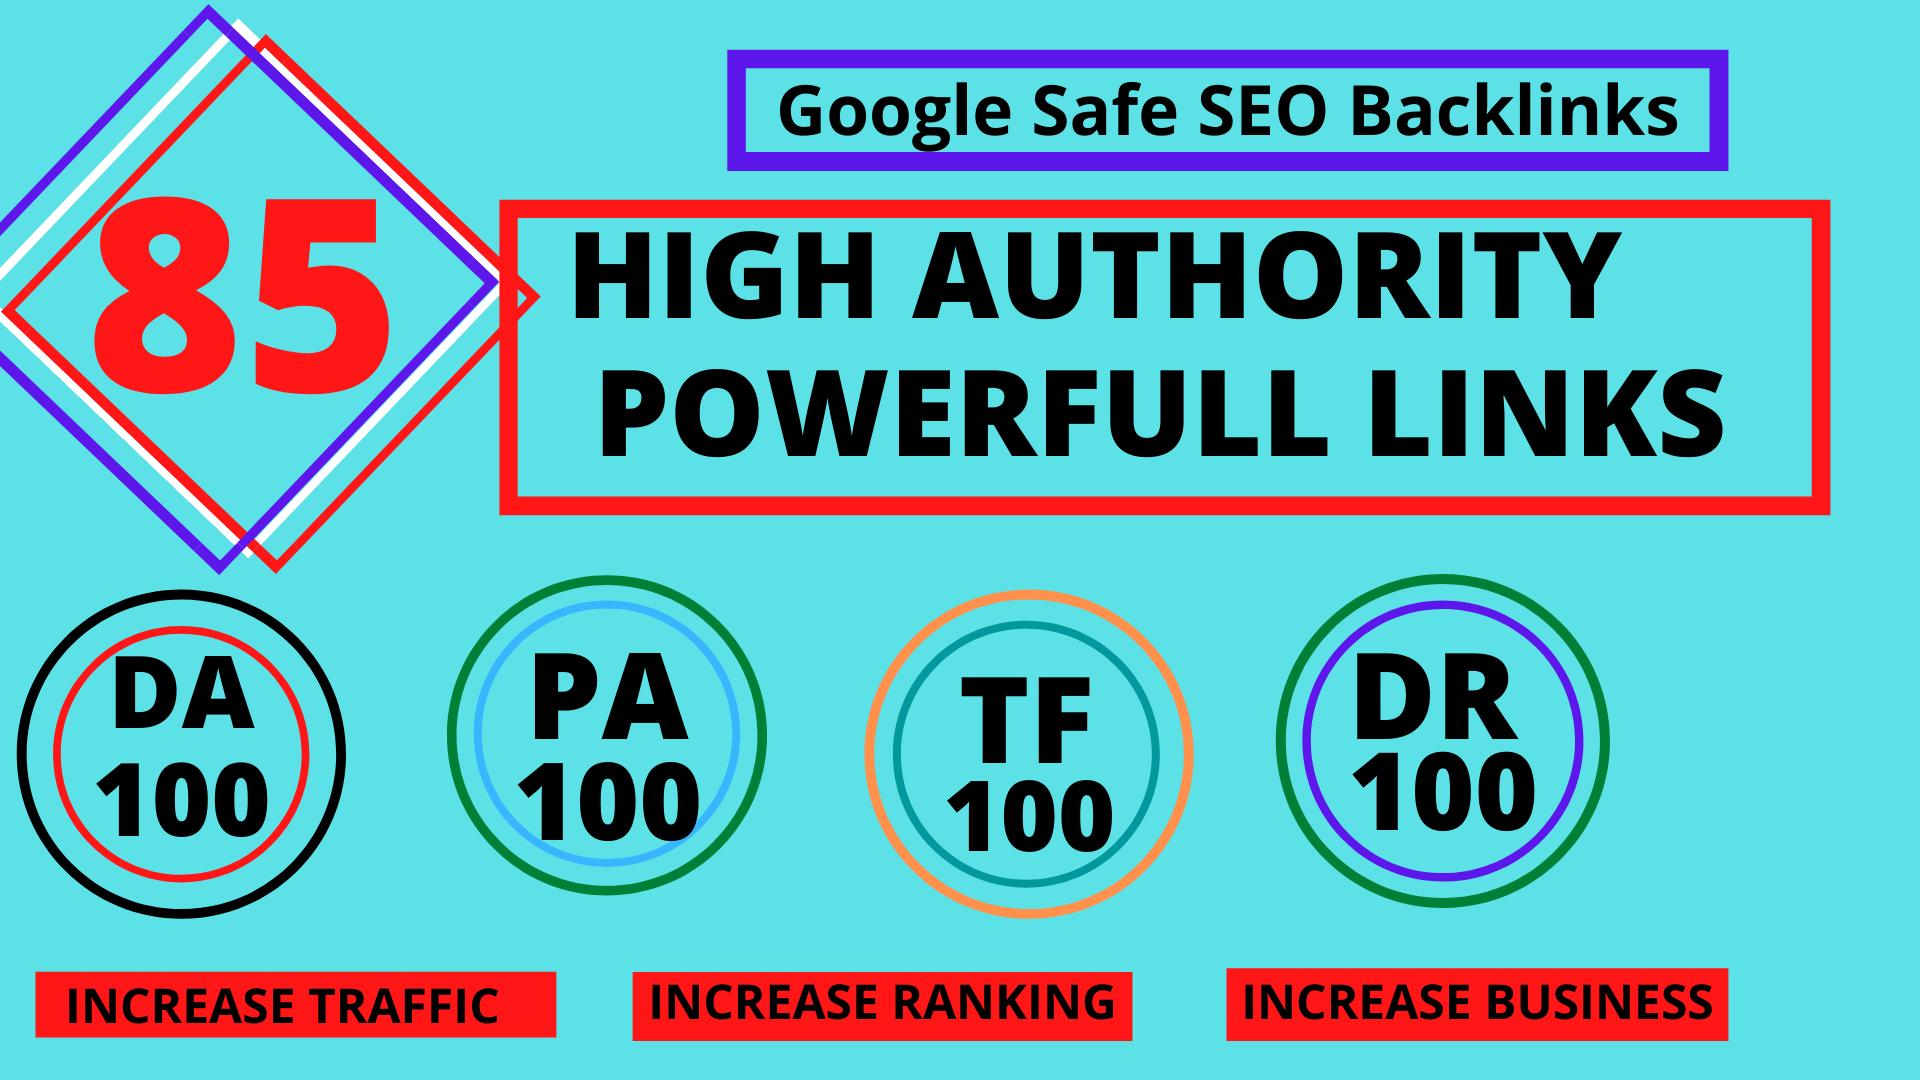 TOP OFFER-Build 85 Unique Domain SEO Backlinks On TF100 DA100 Sites